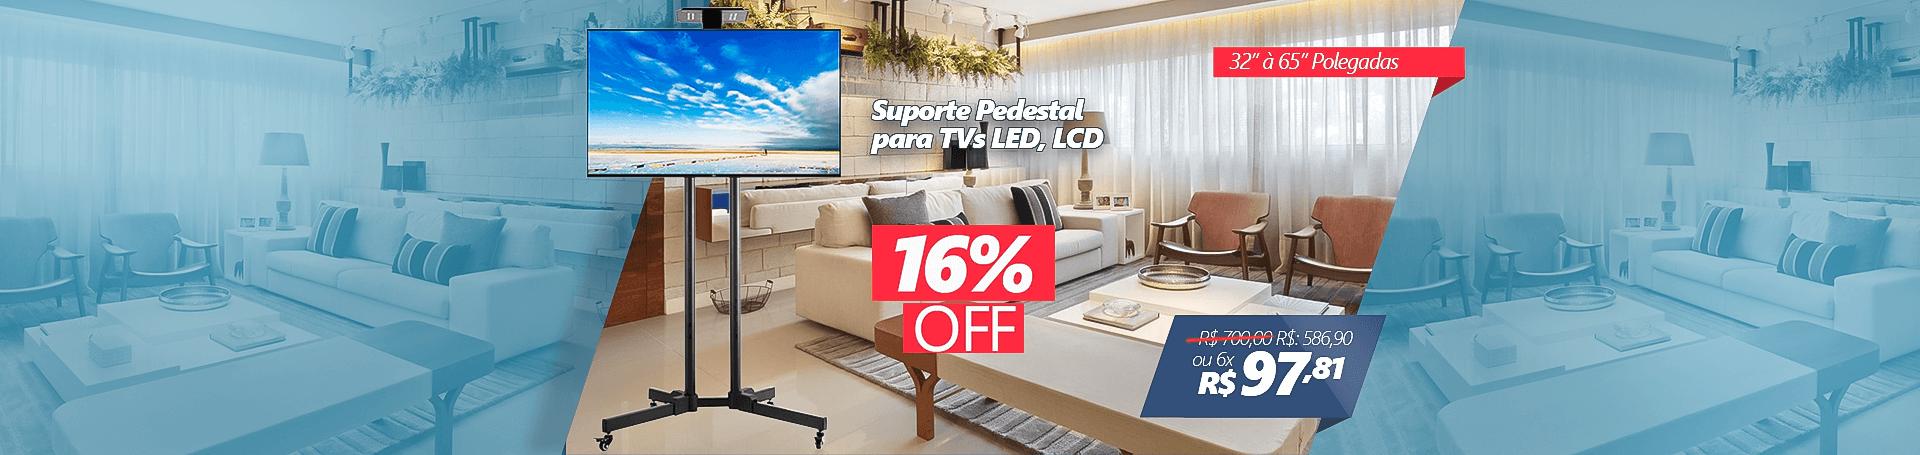 BANNER DESKTOP HOME -   Suporte Pedestal para TVs LED, LCD 32 a 65 Polegadas